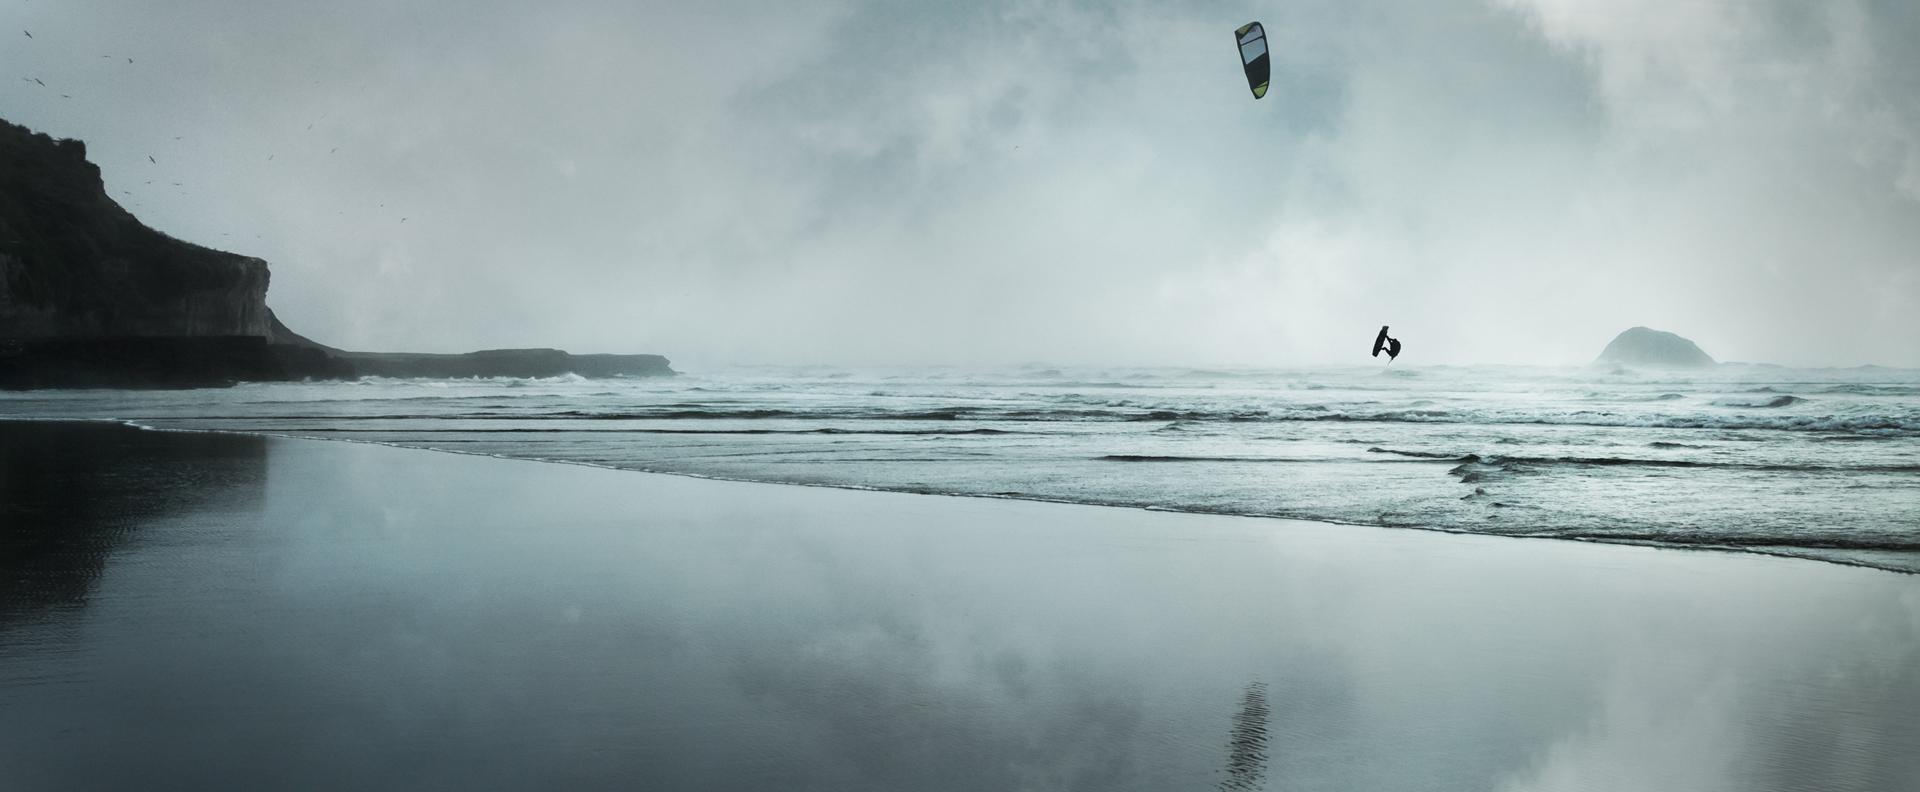 Kitesurfer at Muriwai